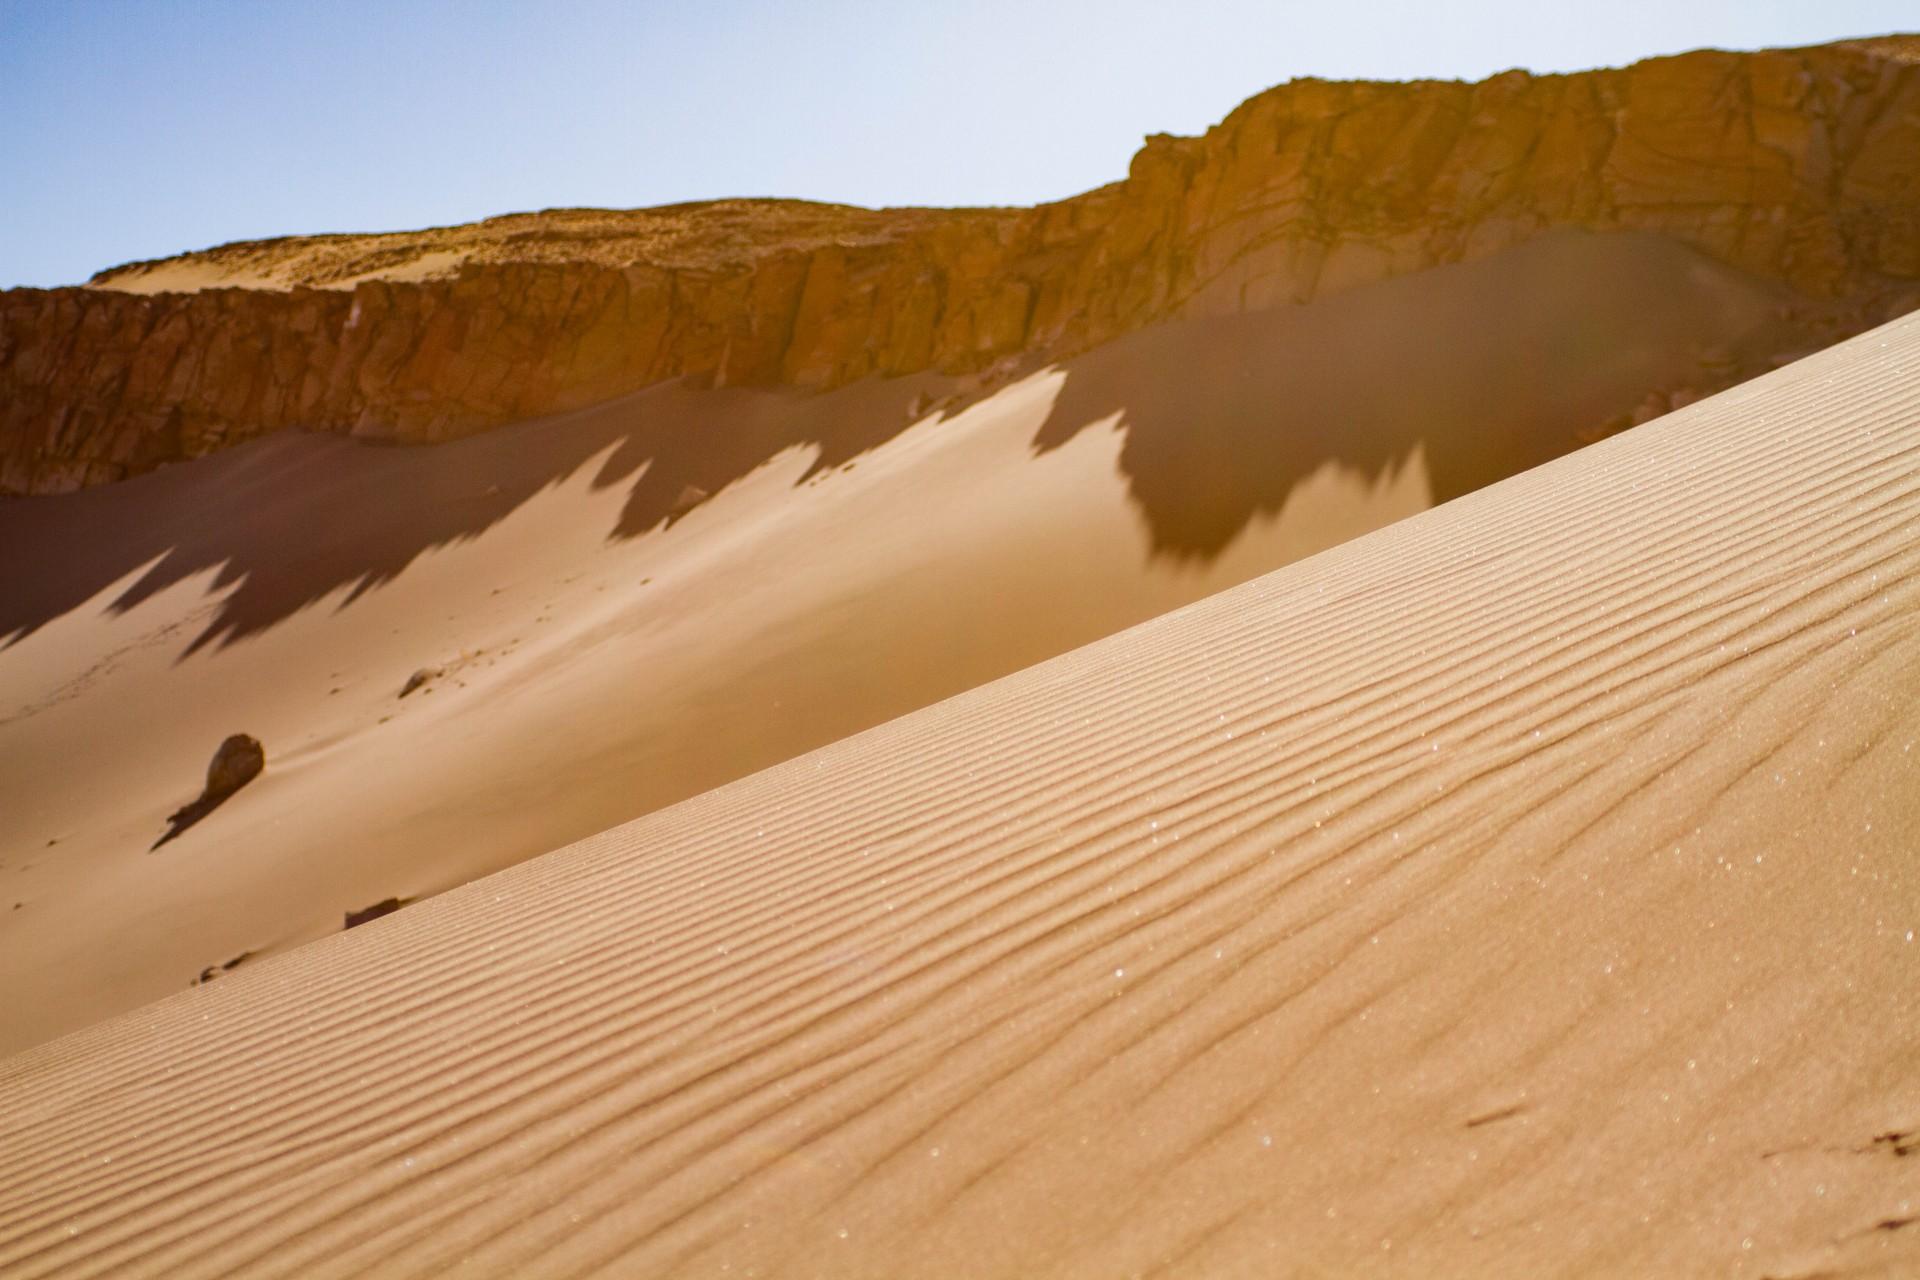 Sand dunes are built up again a rocky ledge in the Atacama desert